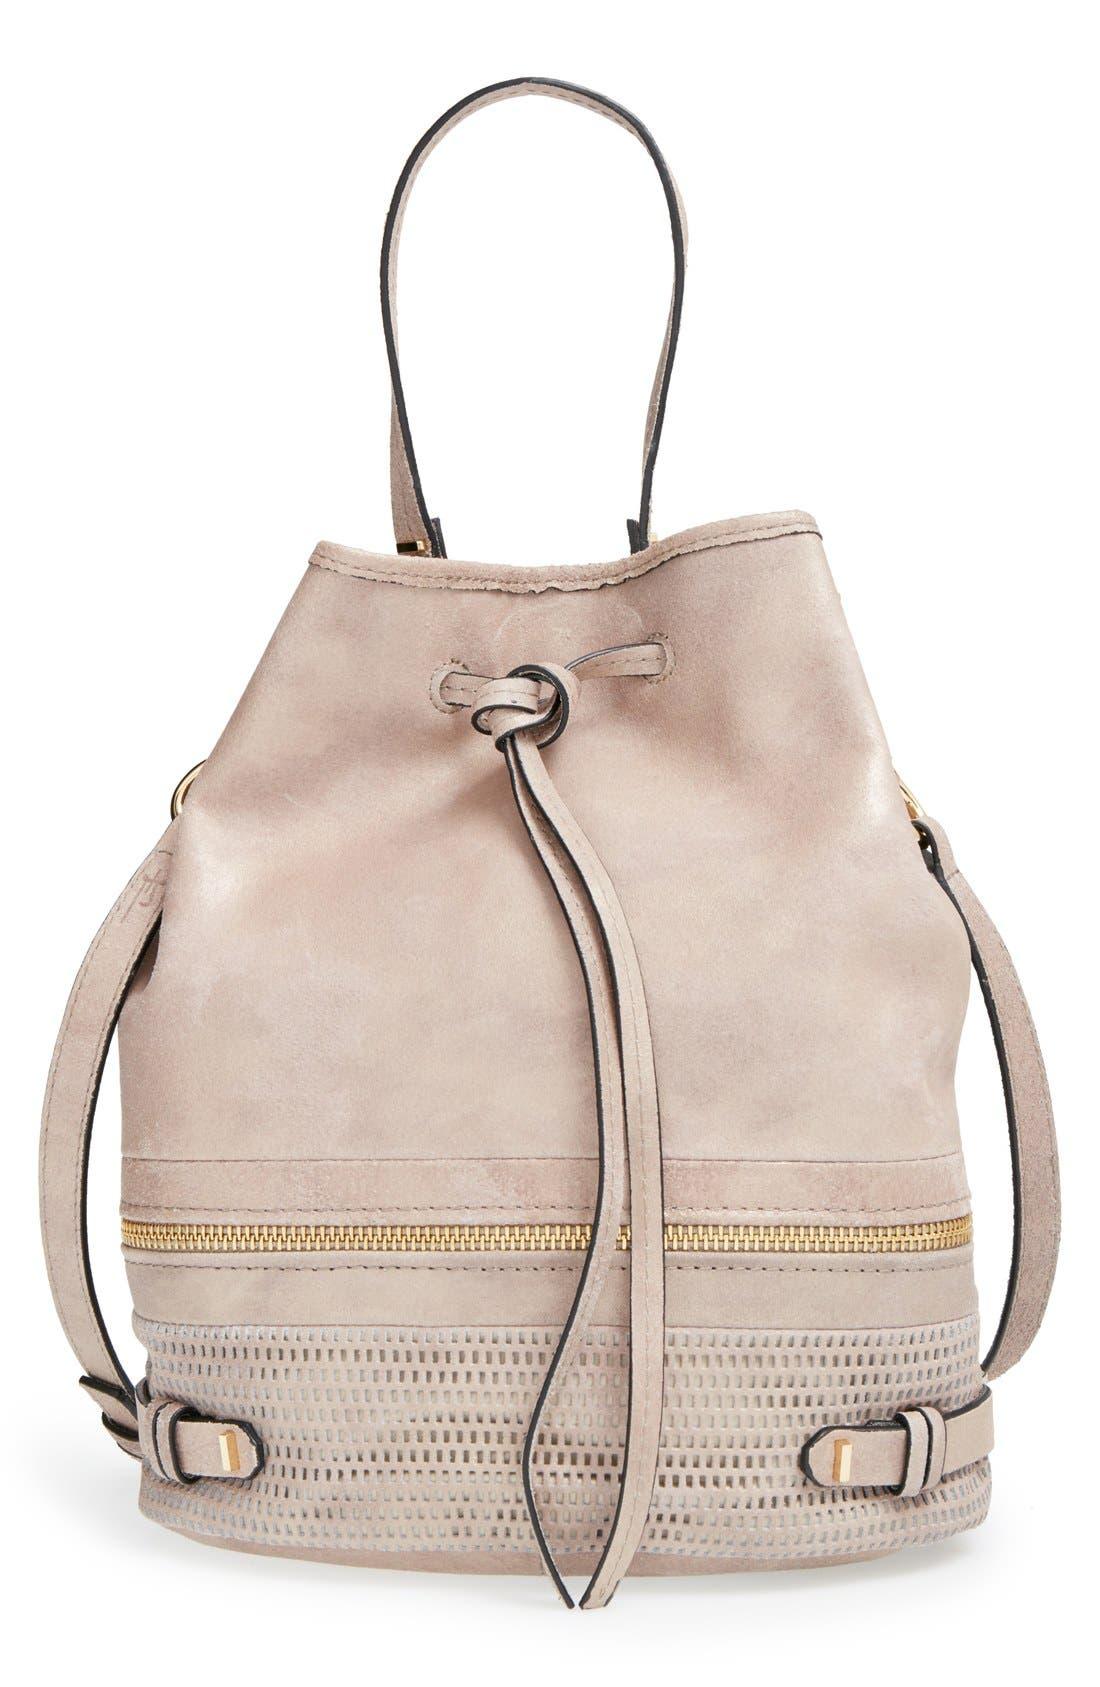 Alternate Image 1 Selected - She + Lo 'Silver Lining' Drawstring Shoulder Bag